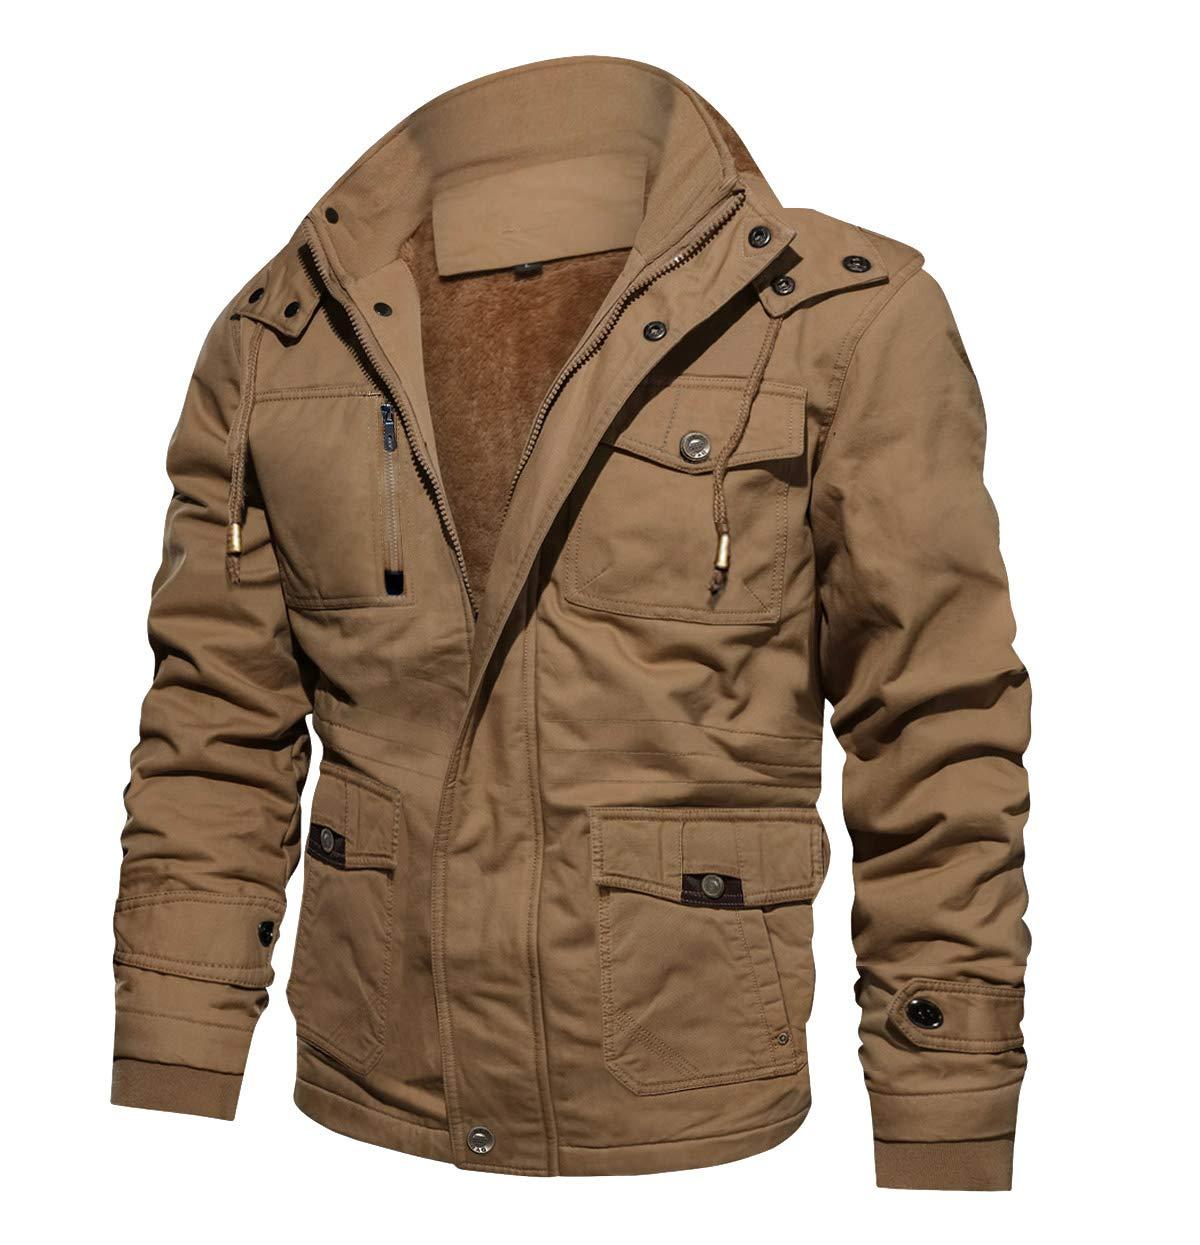 CRYSULLY Men's Fall Fashion Long Sleeve Lightweight Cargo Jacket Military Front Zip Coat Jacket Khaki/US M/tag3XL by CRYSULLY